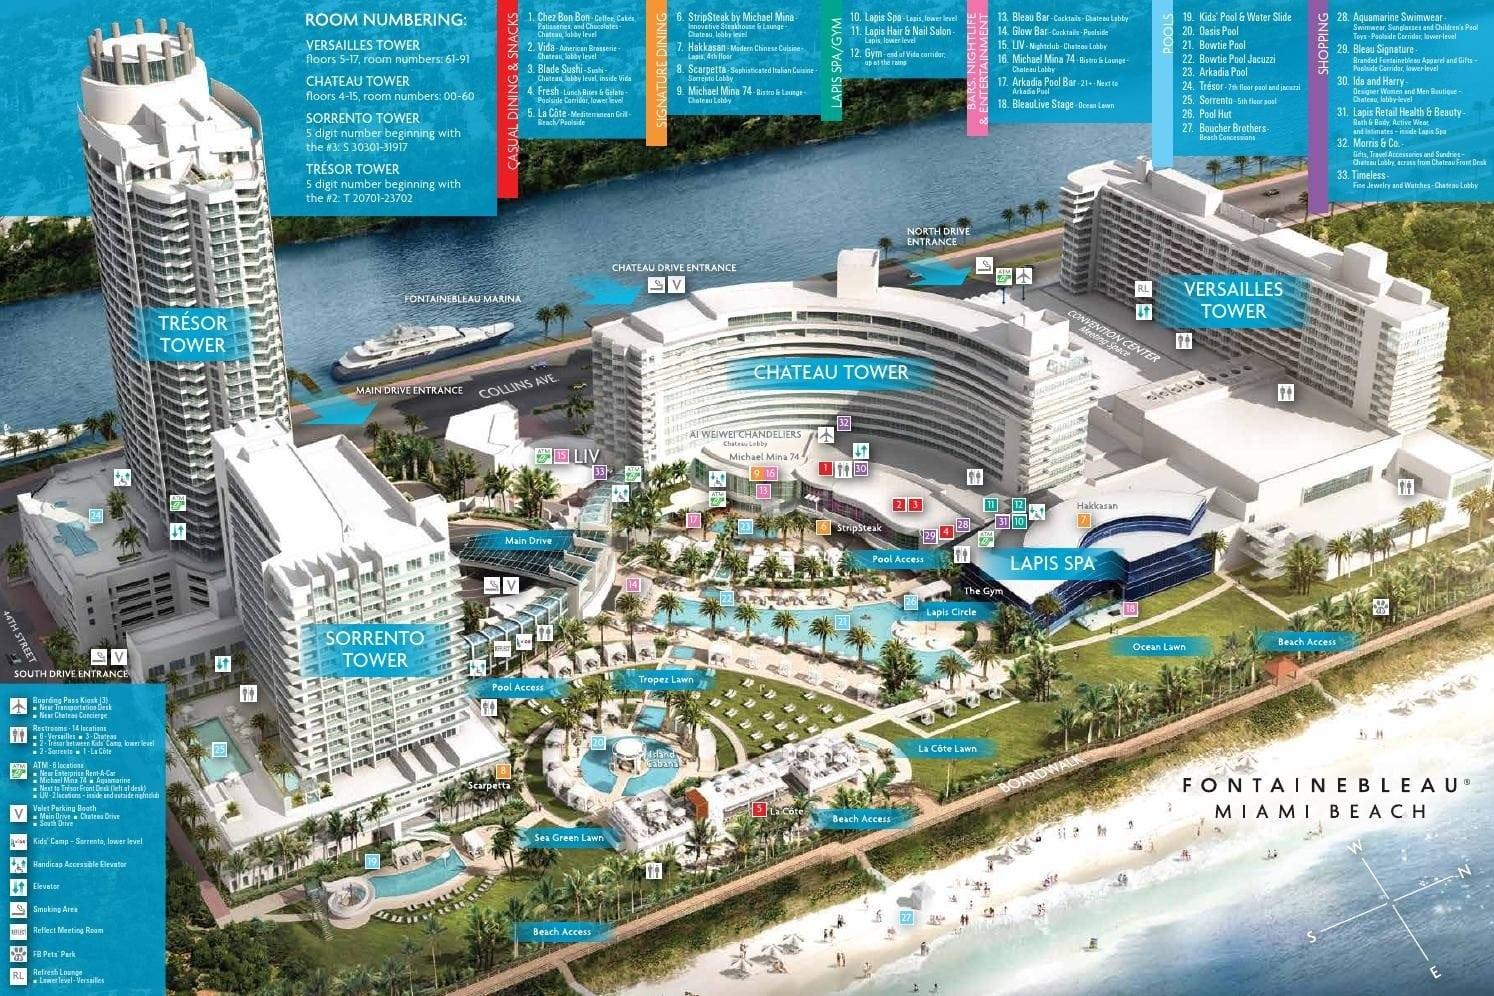 Fontainebleau Hotel Review Miami Fl Eatsleepcruise Com